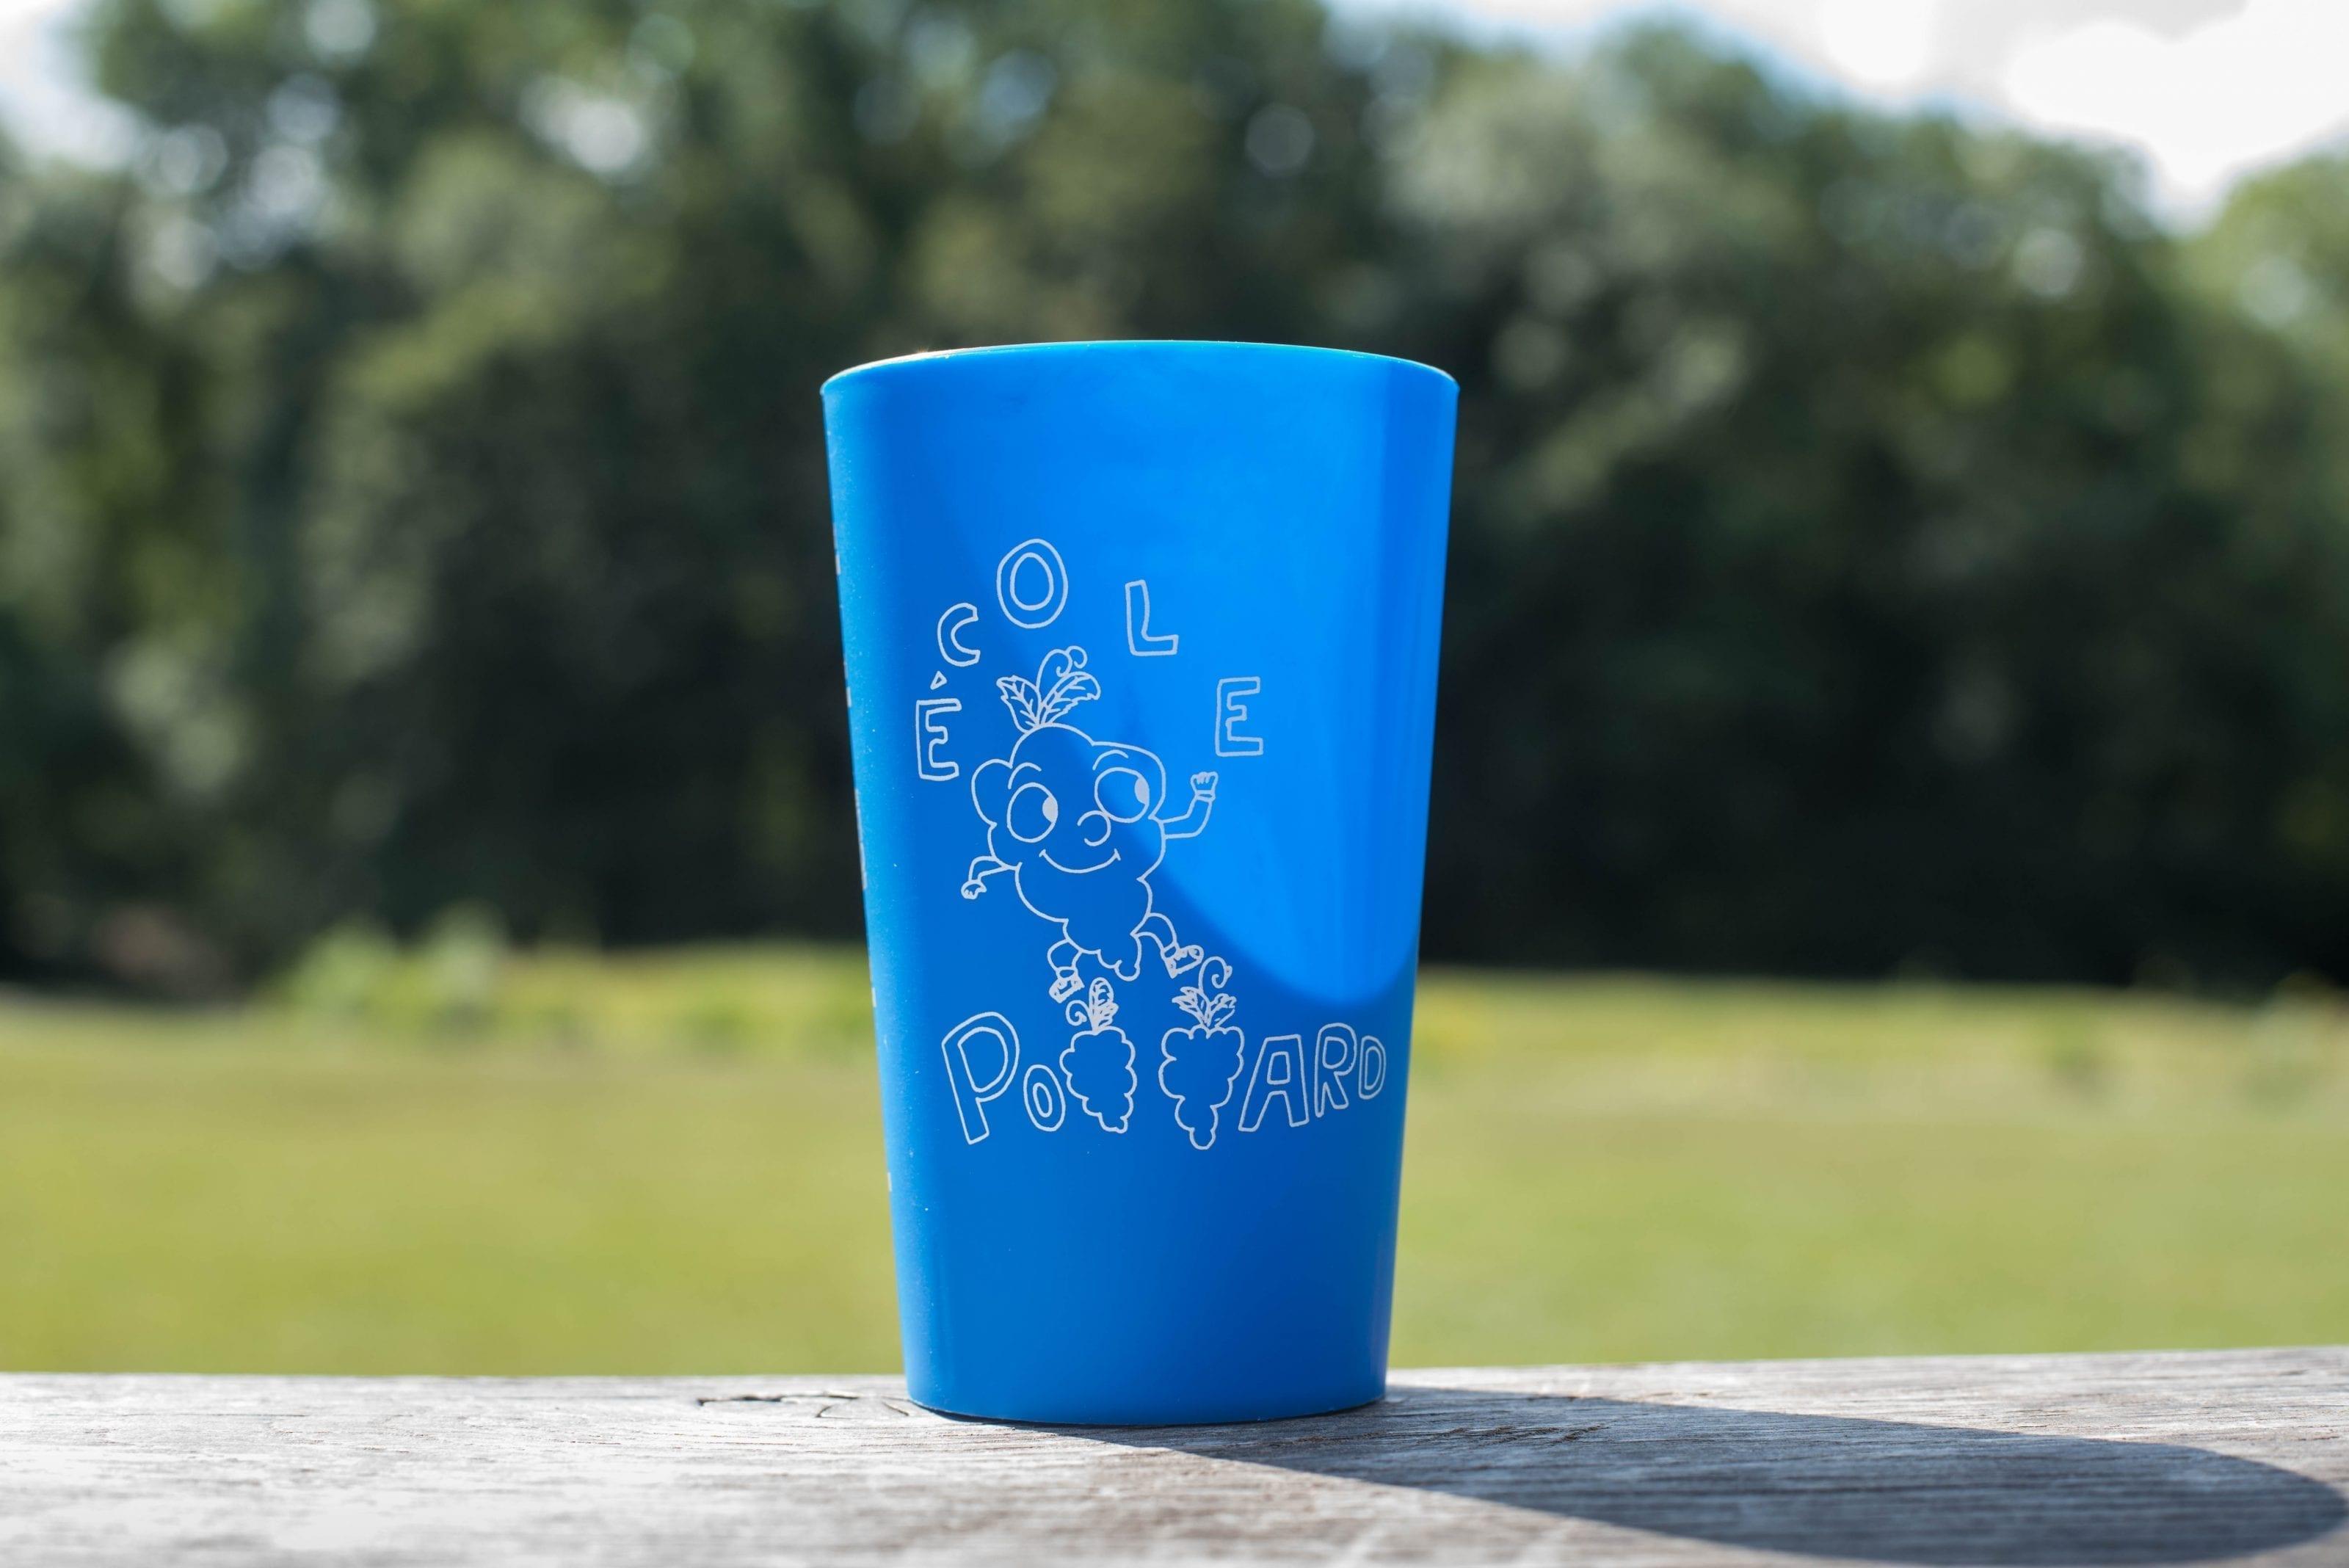 verre bleu ecole